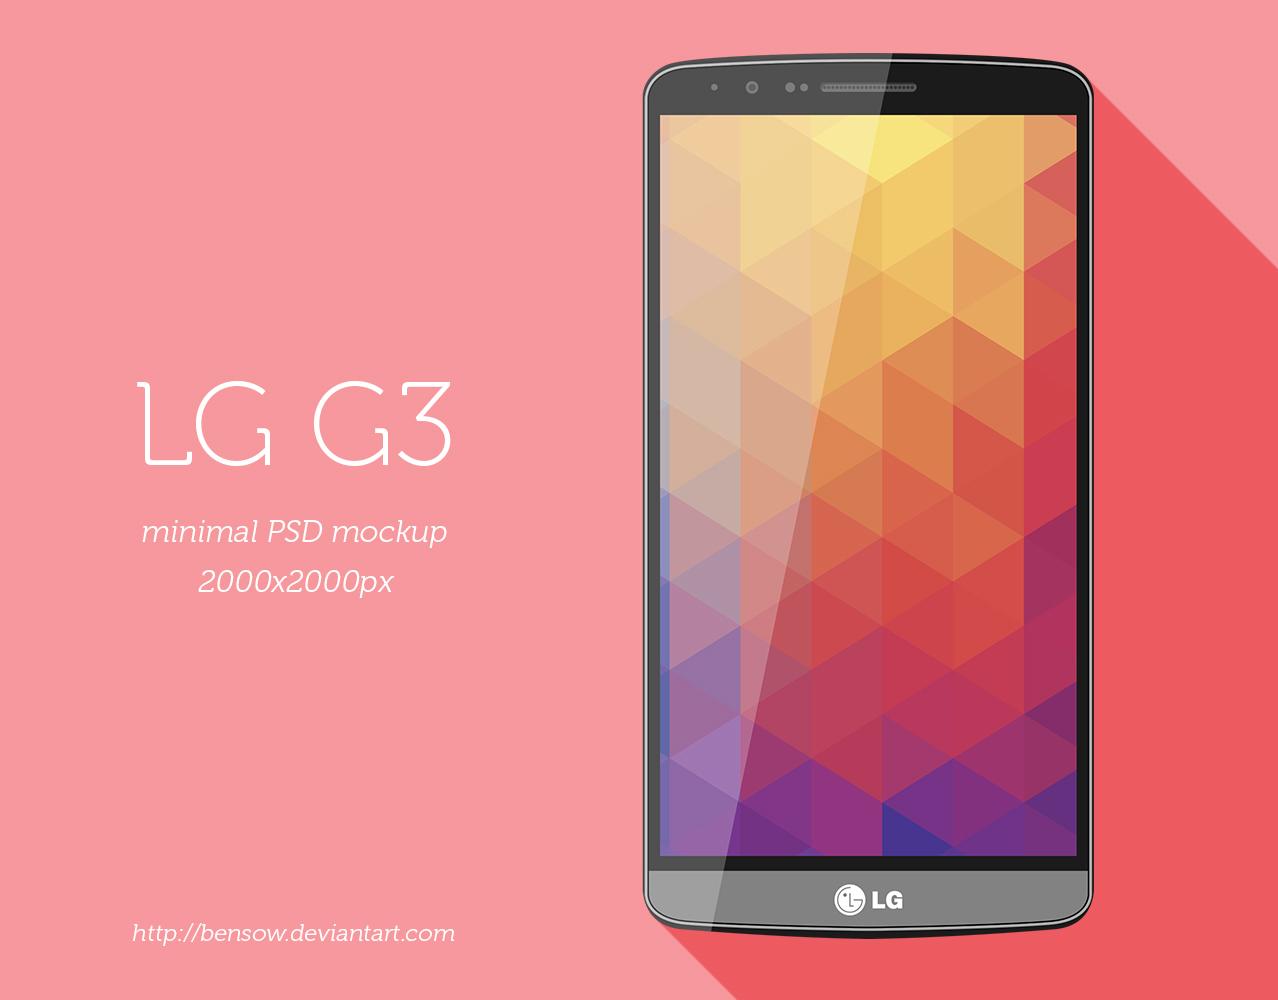 LG G3 Minimal PSD